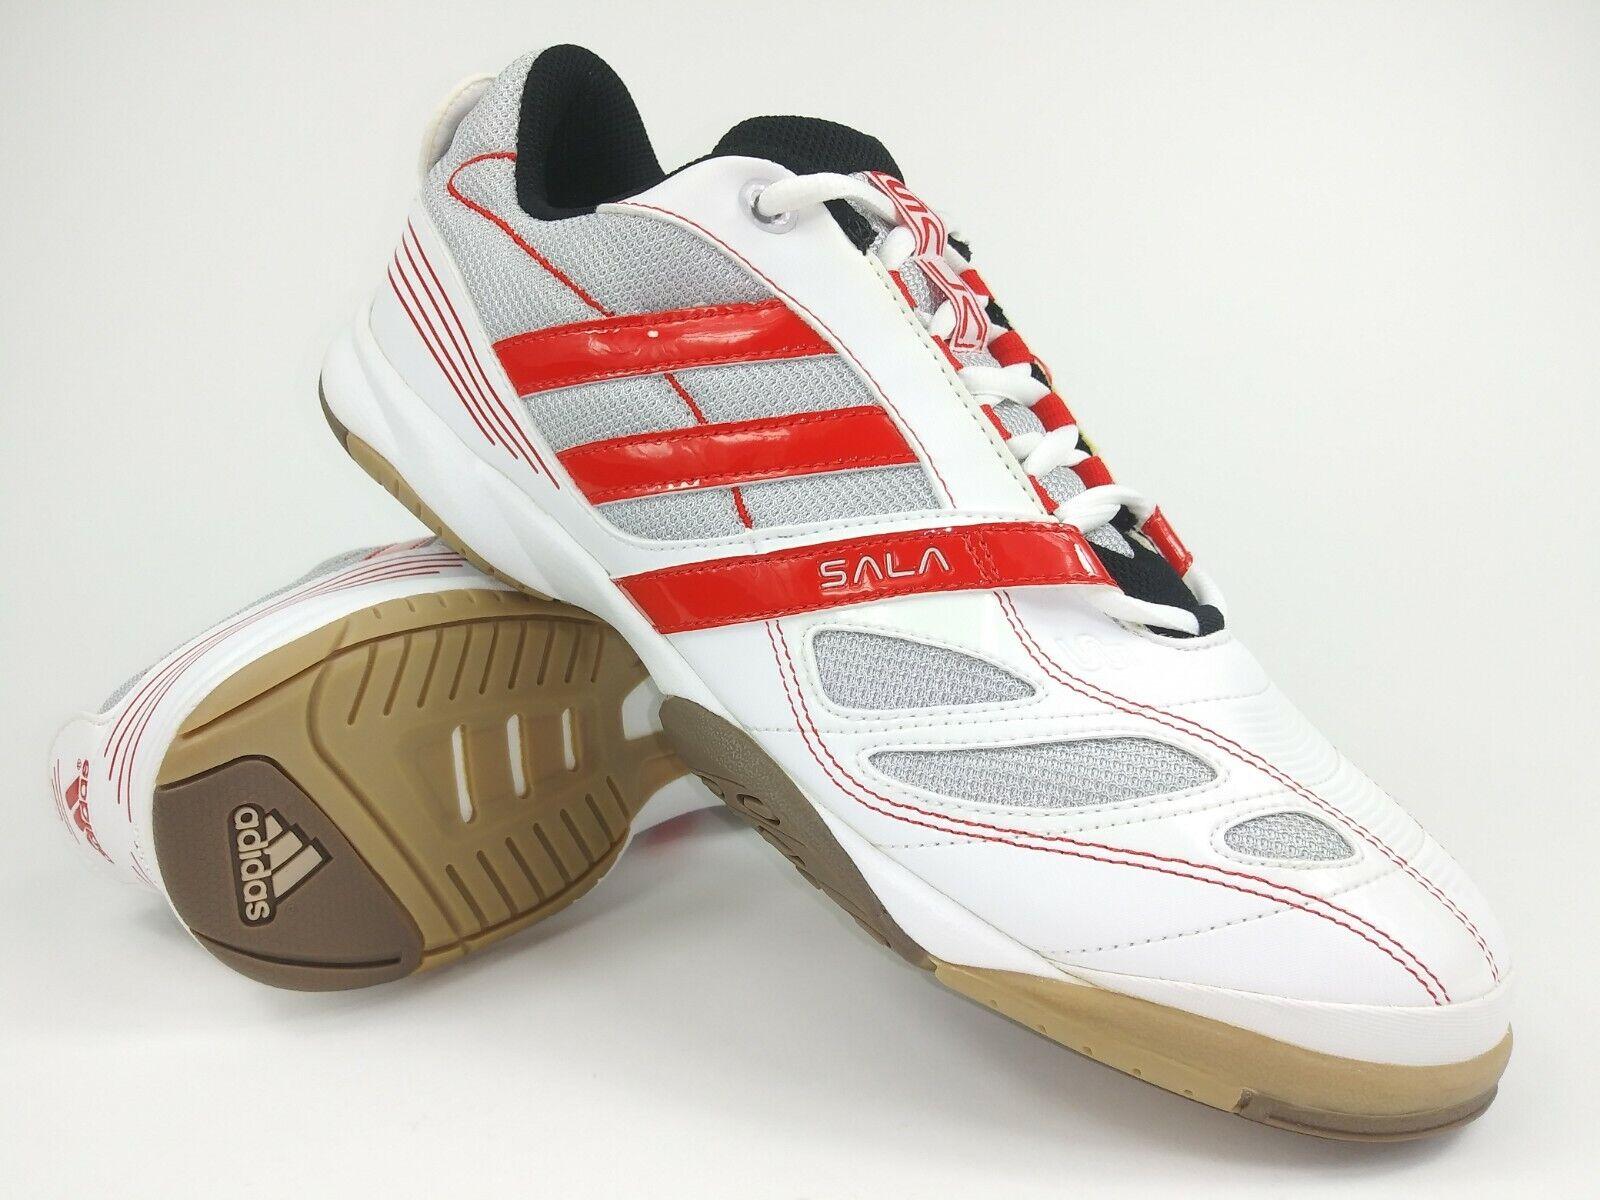 Adidas Hombre Raro Súper Sala VI 011225 blancoo Rojo Interior Fútbol Zapatos